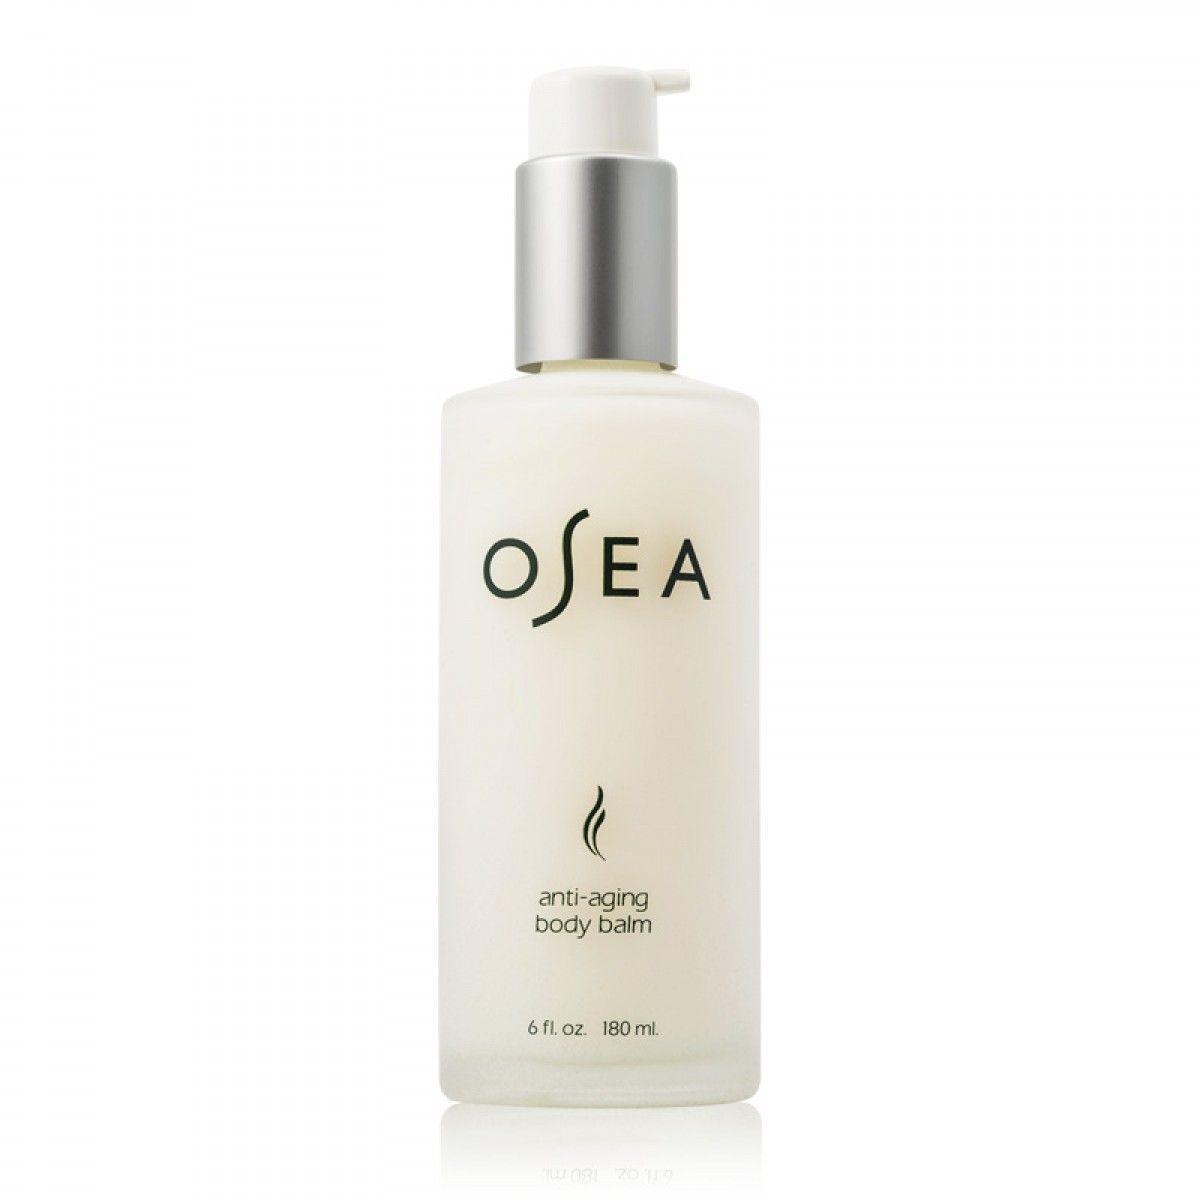 Osea Anti Aging Body Balm Vegan Natural Skin Care Anti Aging Body Natural Anti Aging Skin Care Anti Aging Skin Treatment